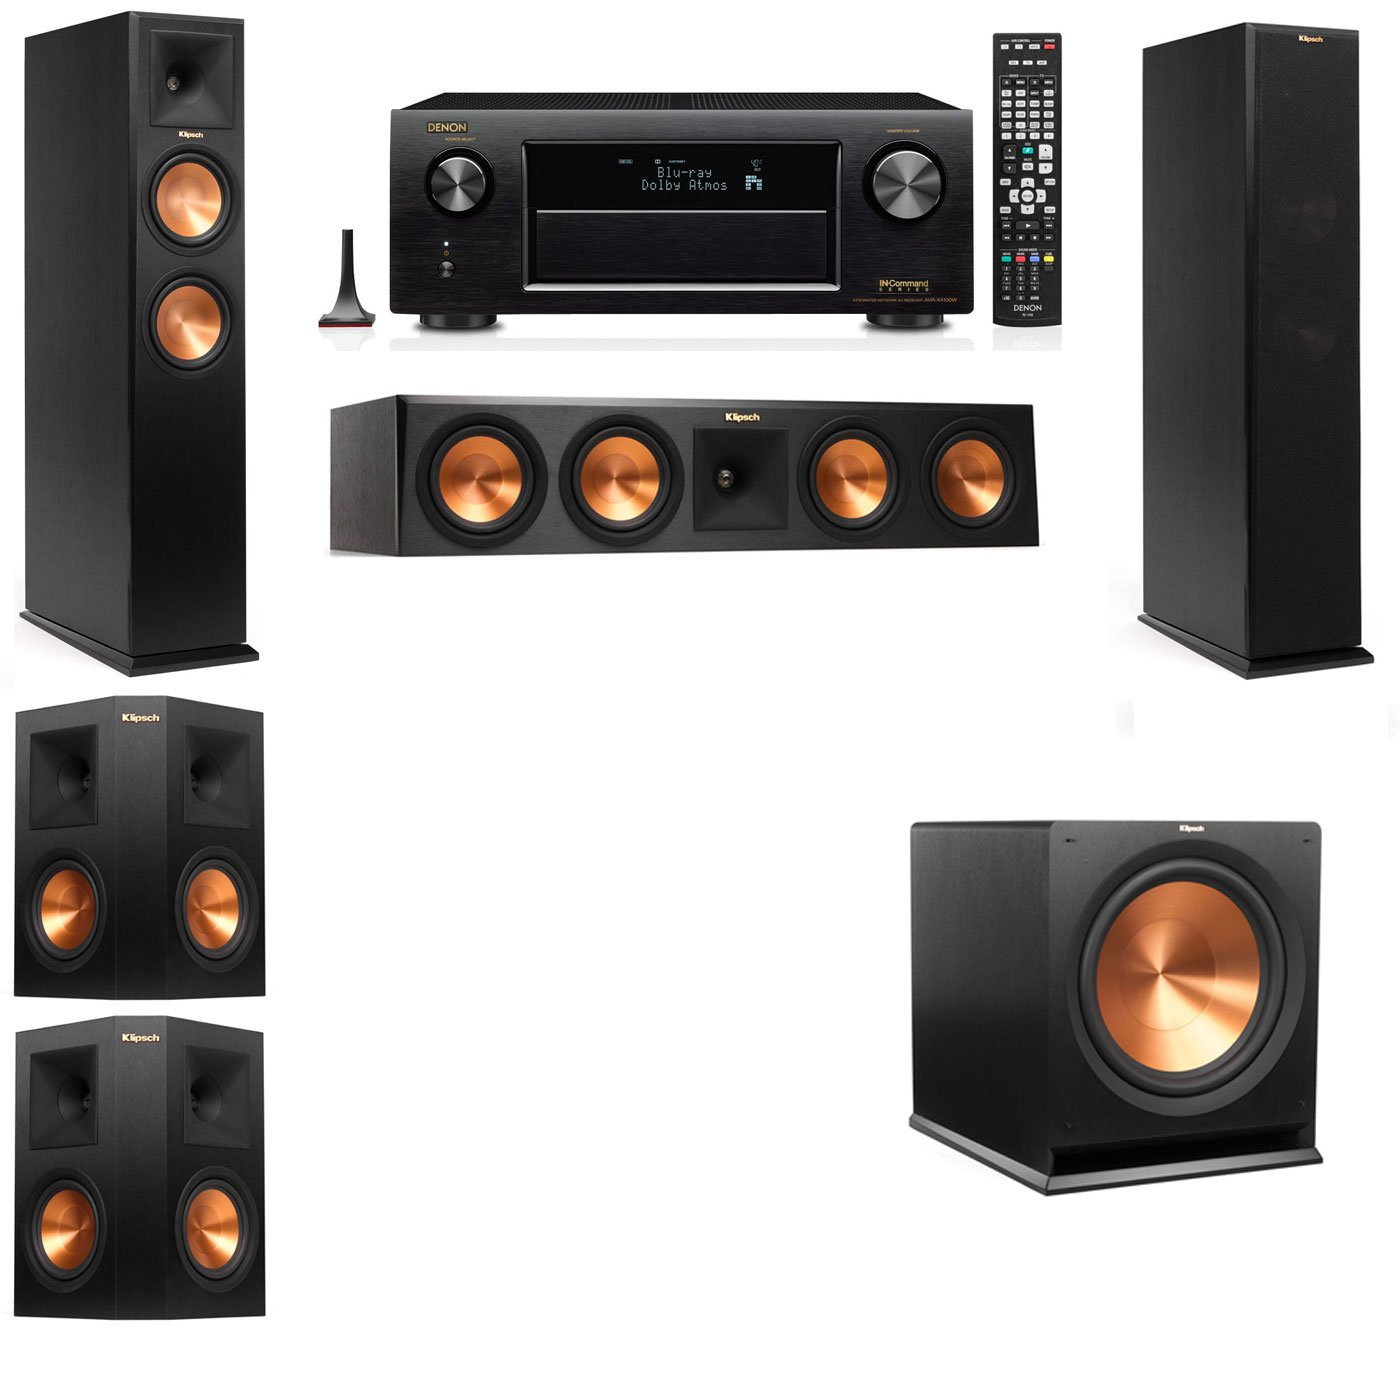 klipsch 5 1 speakers. amazon.com: klipsch rp-260f tower speakers-5.1-denon avr-x4100w: electronics 5 1 speakers